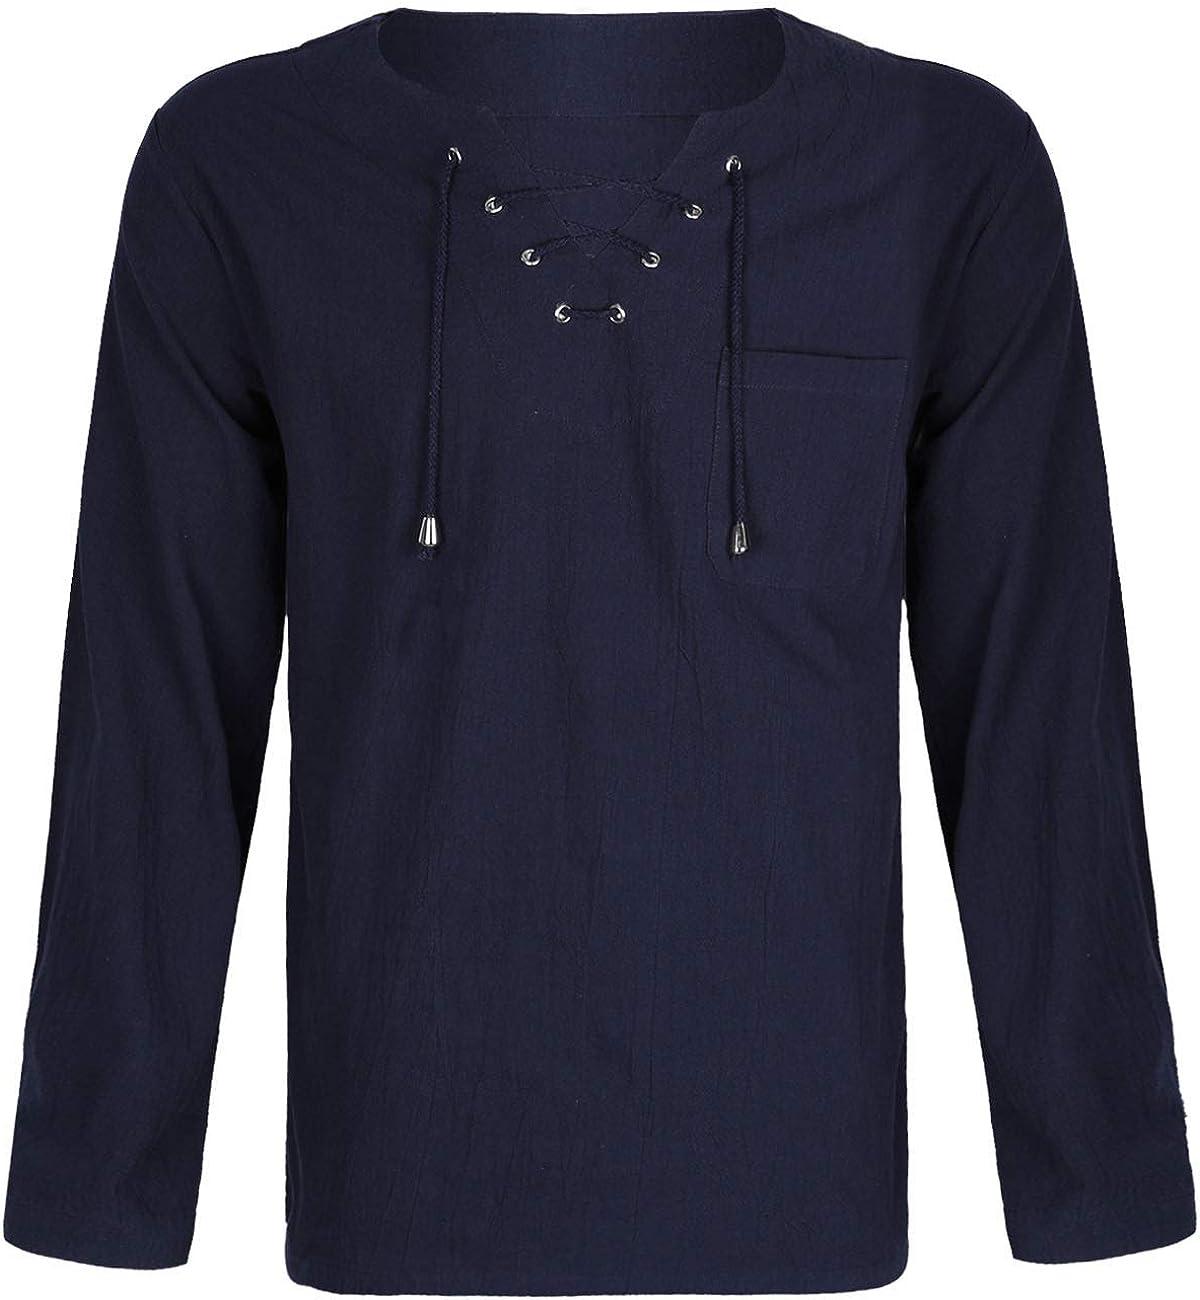 Fashonal Cotton Linen V Neck Hippie Shirt Lace Up Long Sleeve Tunic Tops for Men